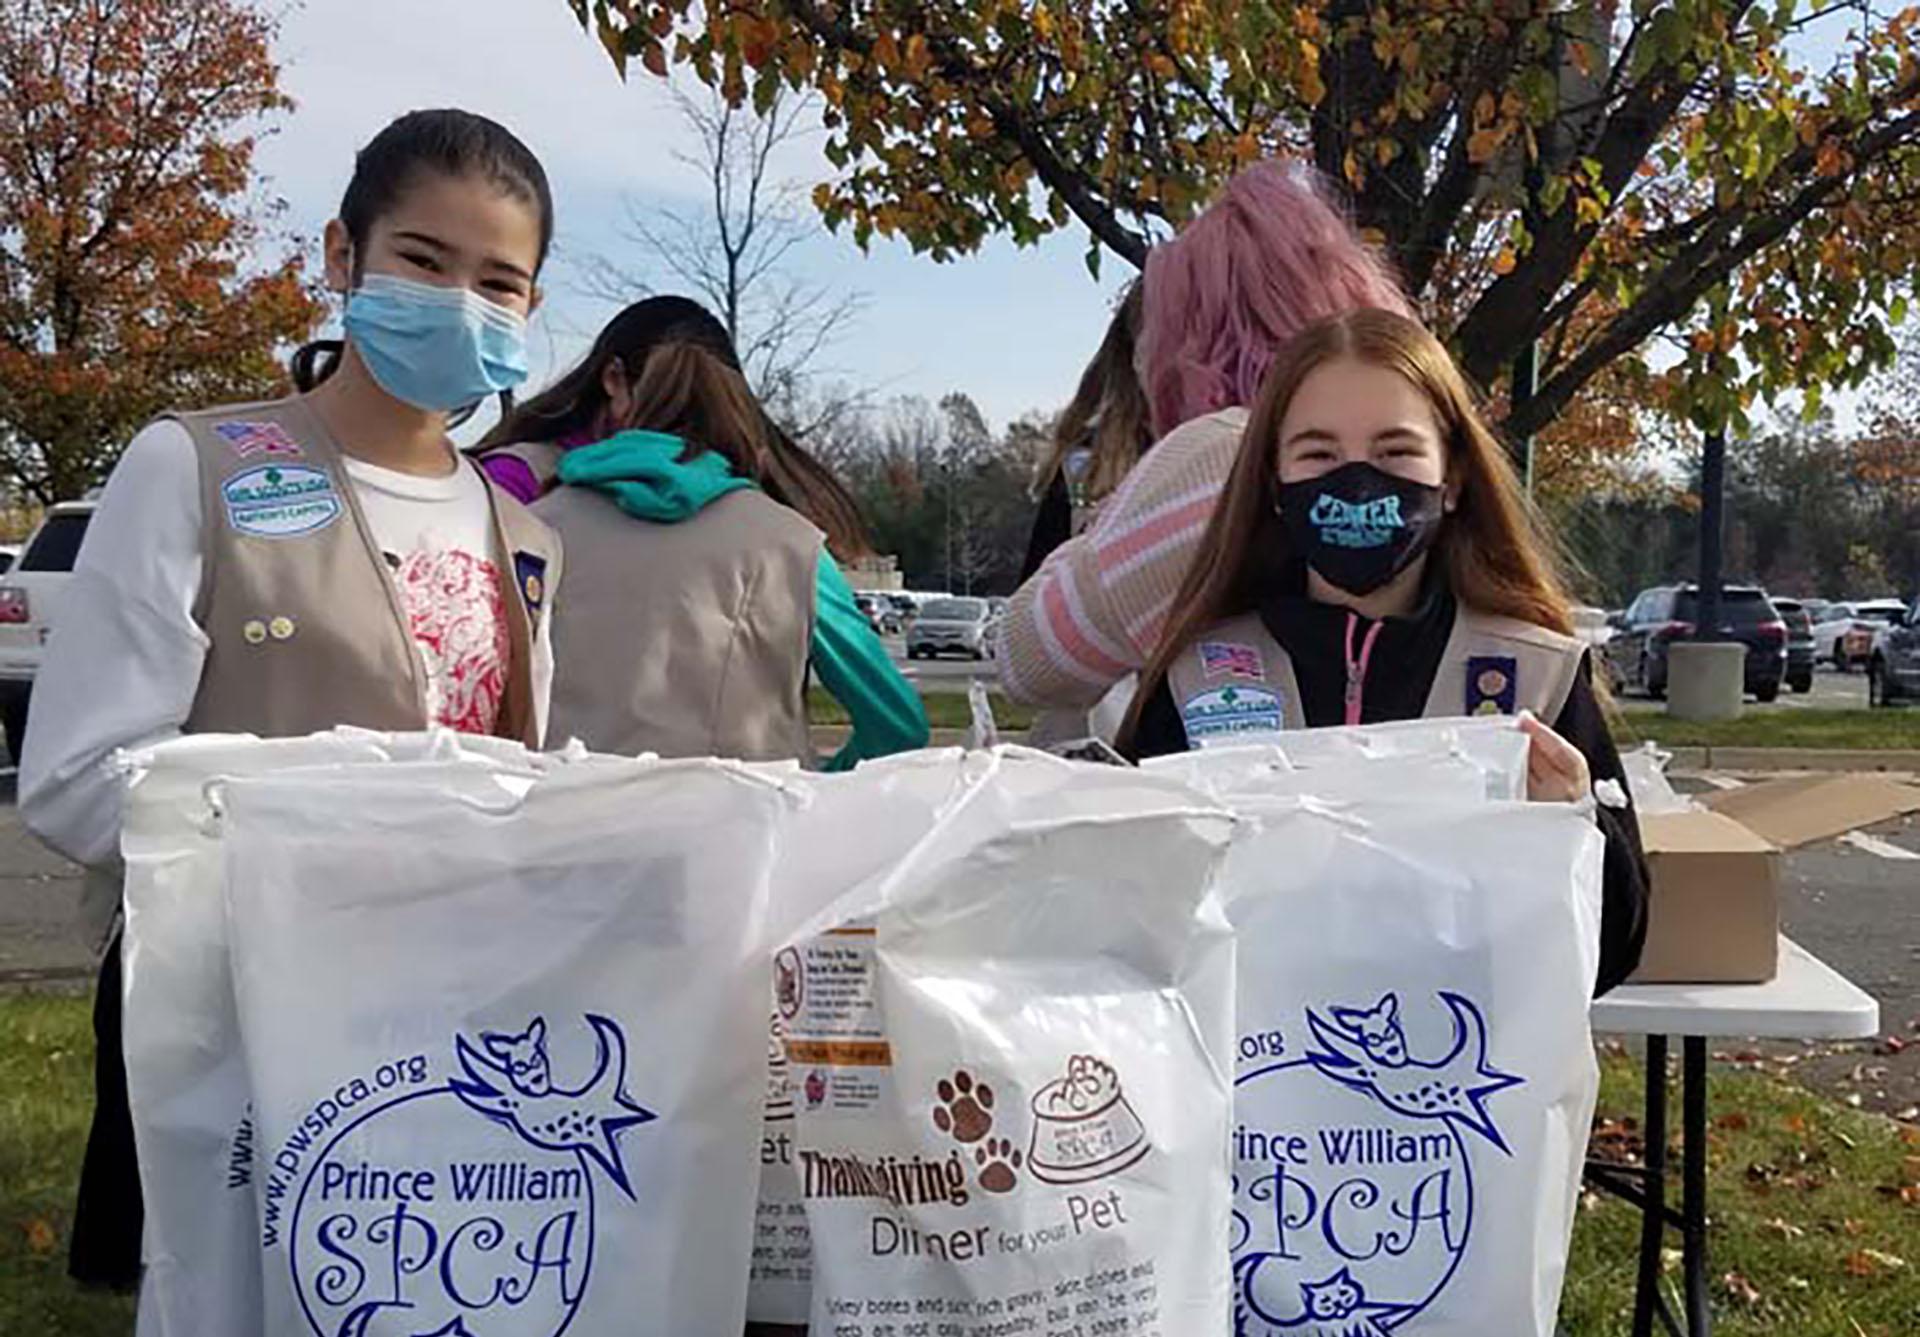 Prince William SPCA, girl scouts donate pet food